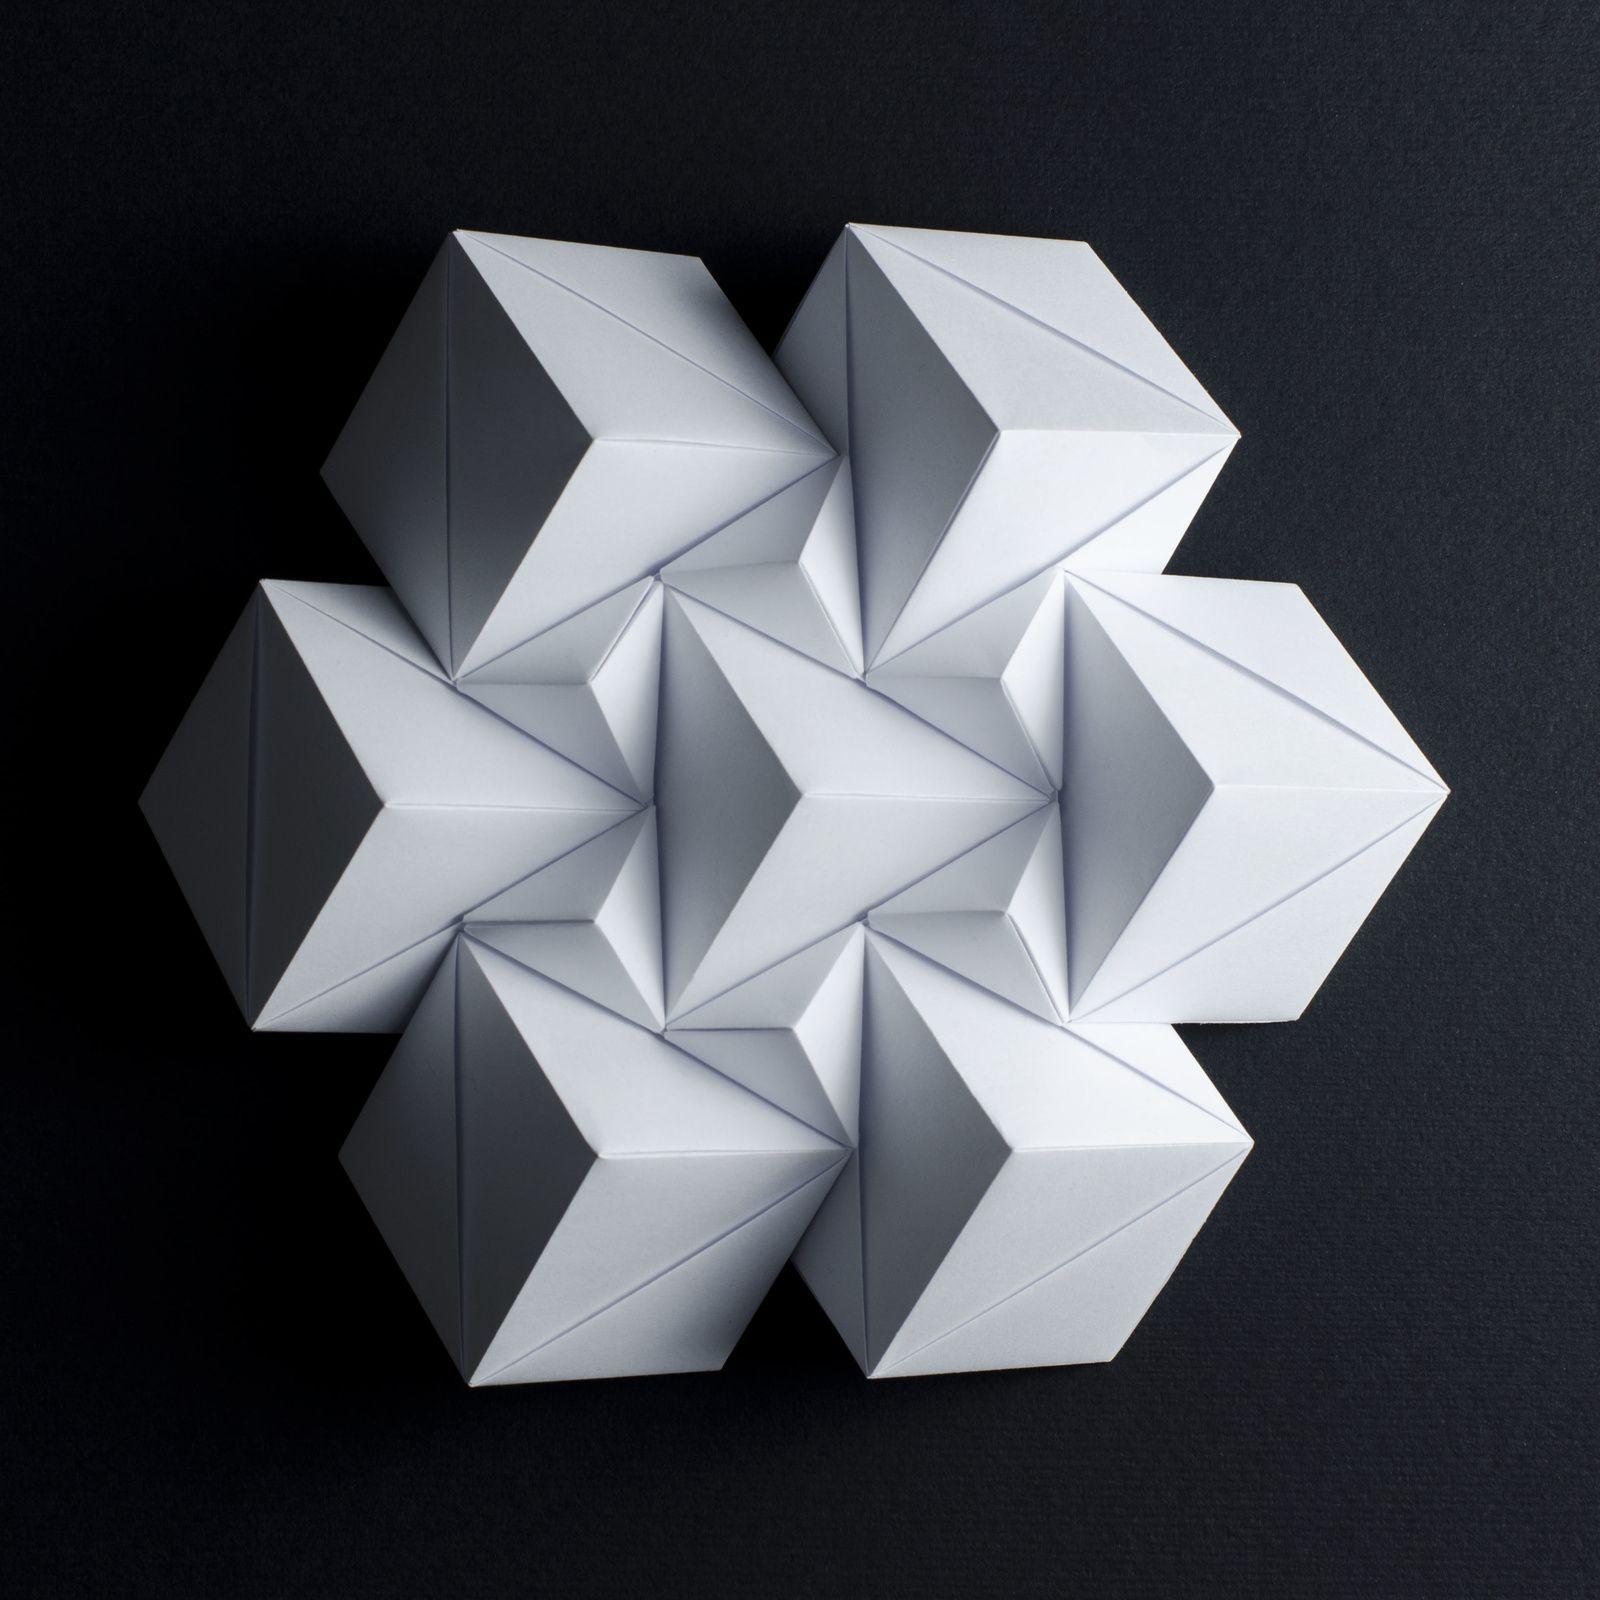 Rigid Origami - Grasshopper | 1600x1600